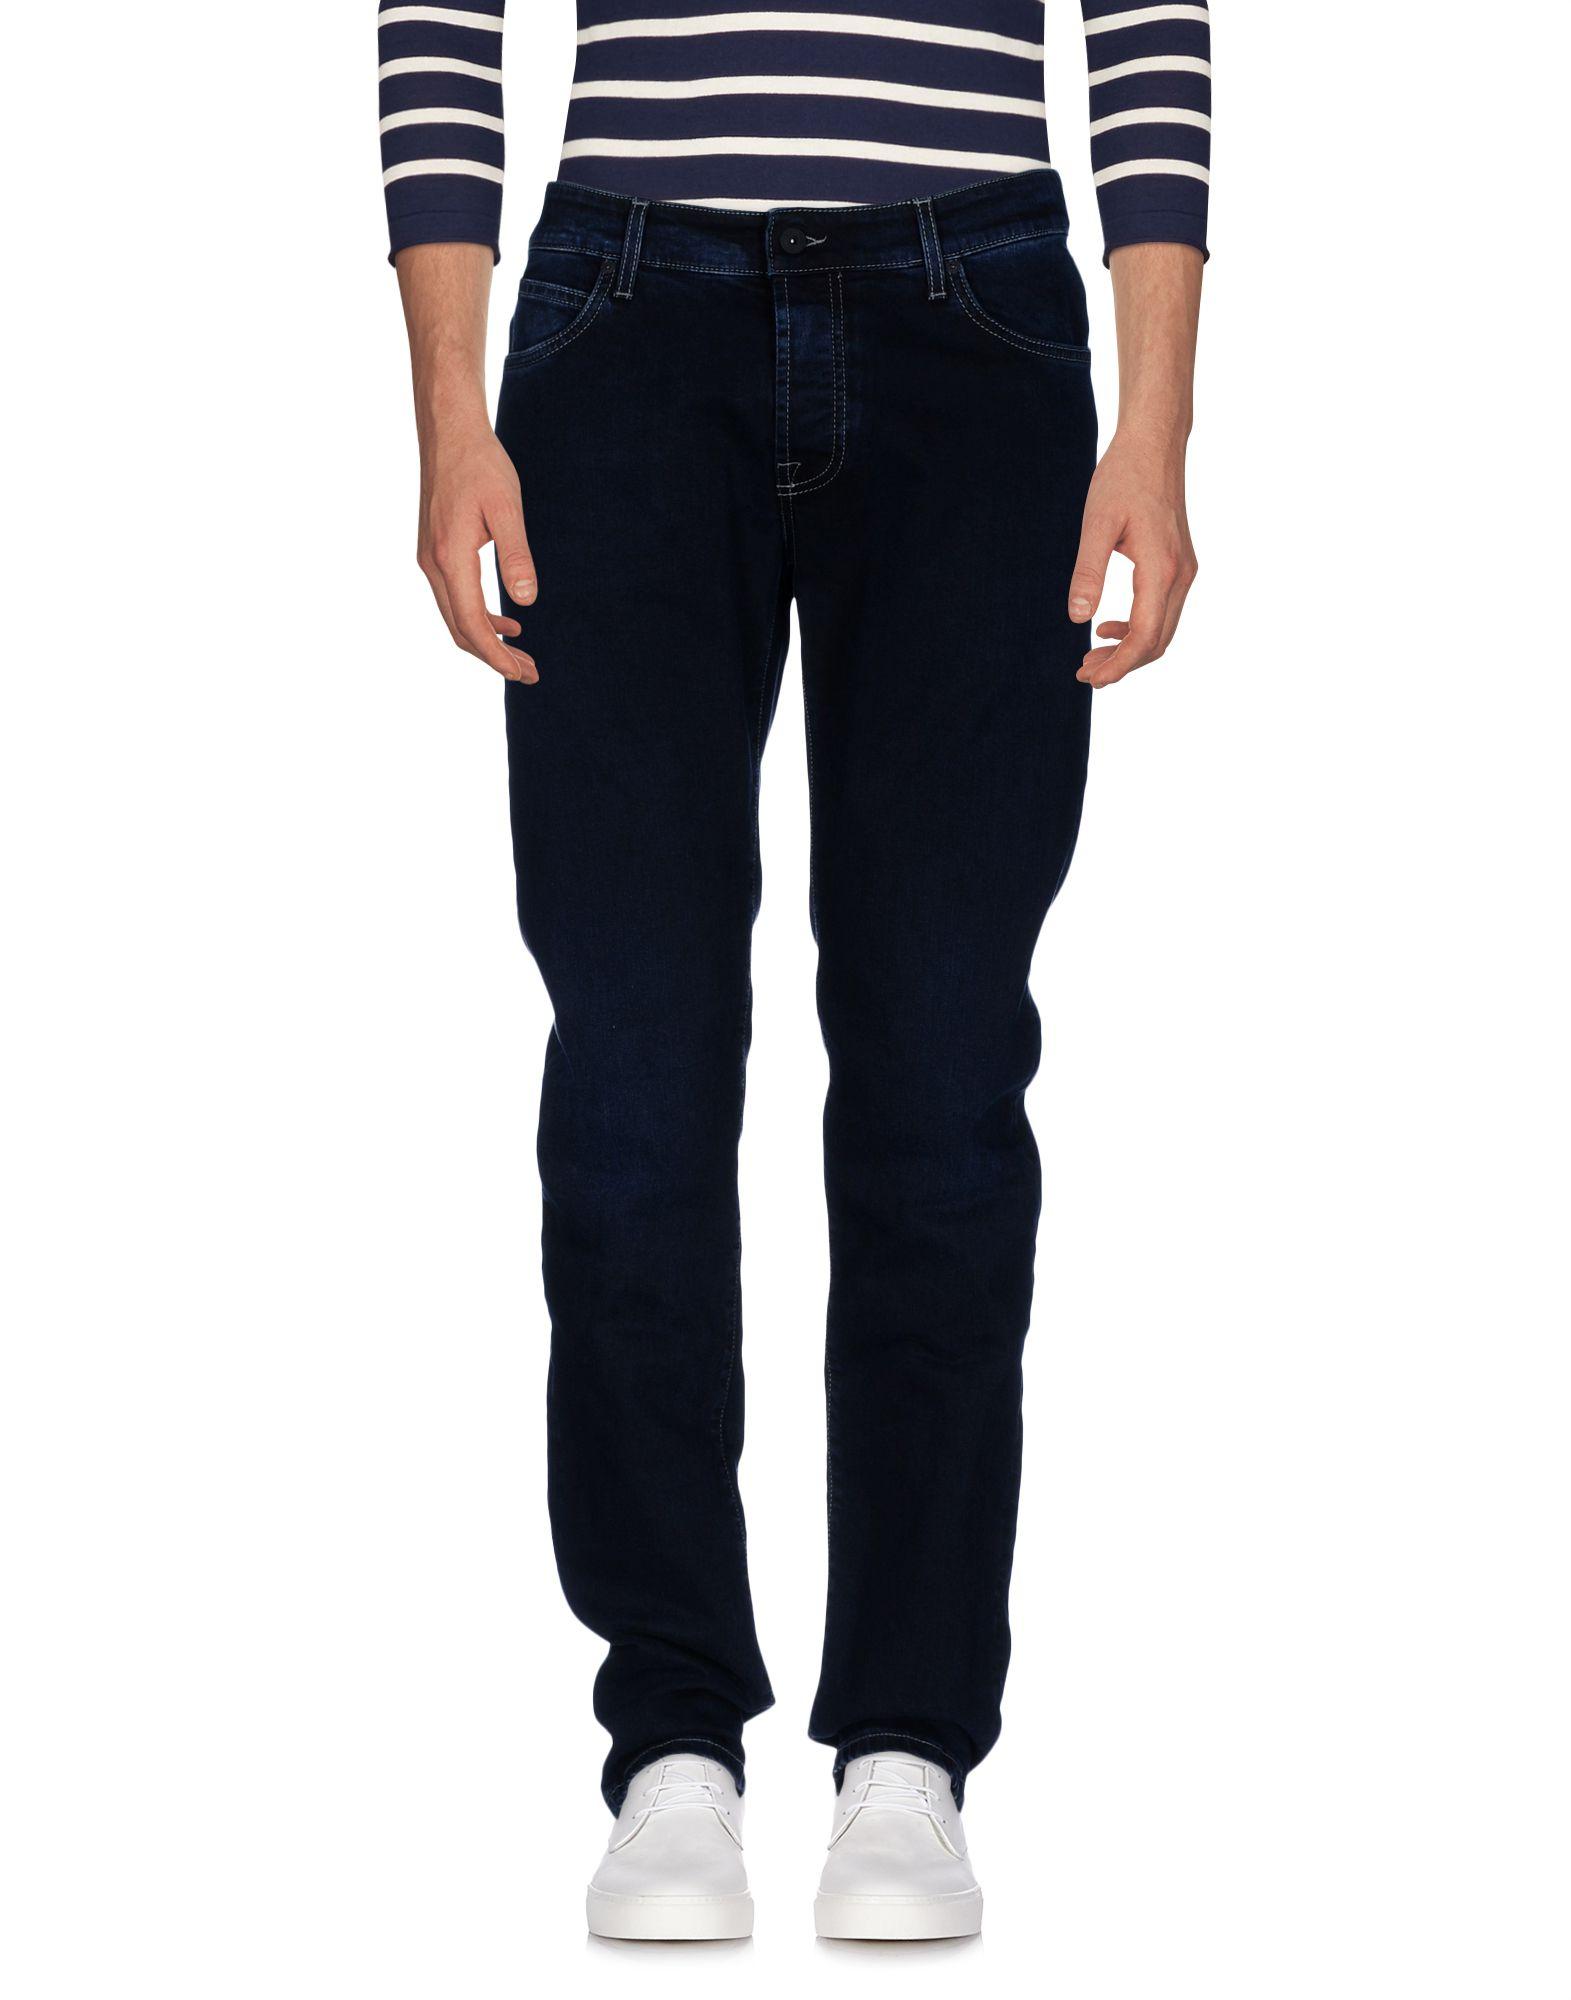 Pantaloni Jeans Roÿ Rogers Uomo - Acquista online su